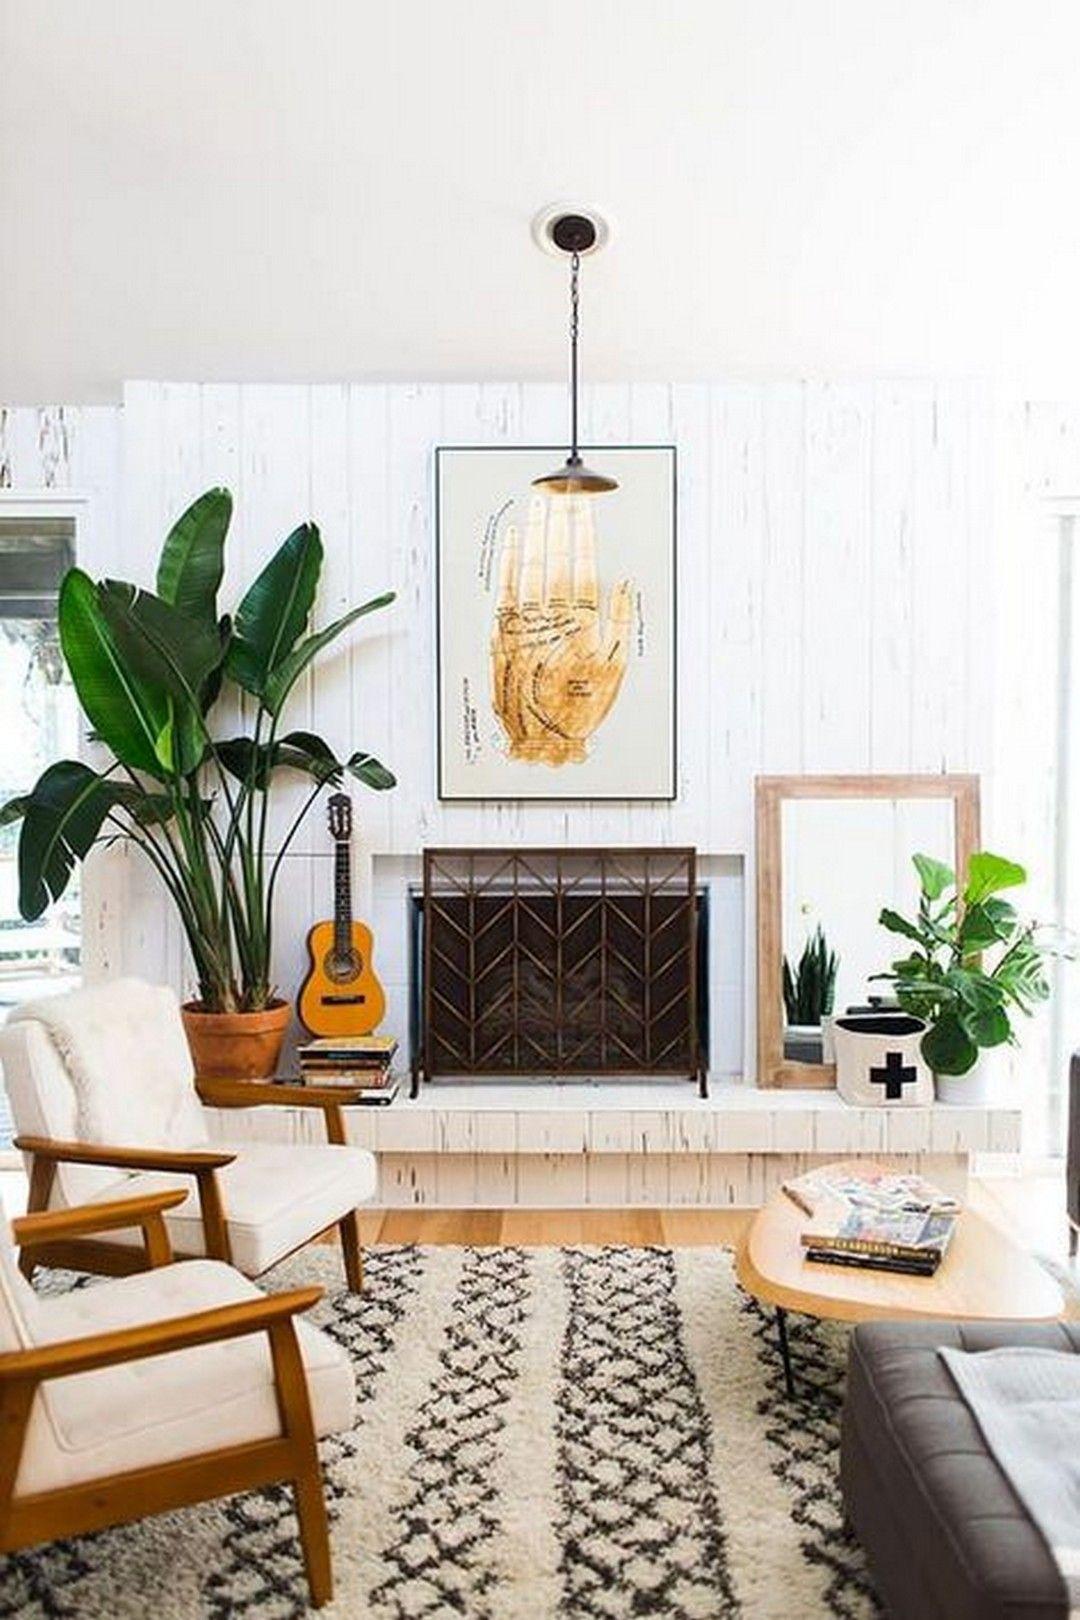 20 Captivating Mid Century Modern Living Room Design Ideas | Mid ...